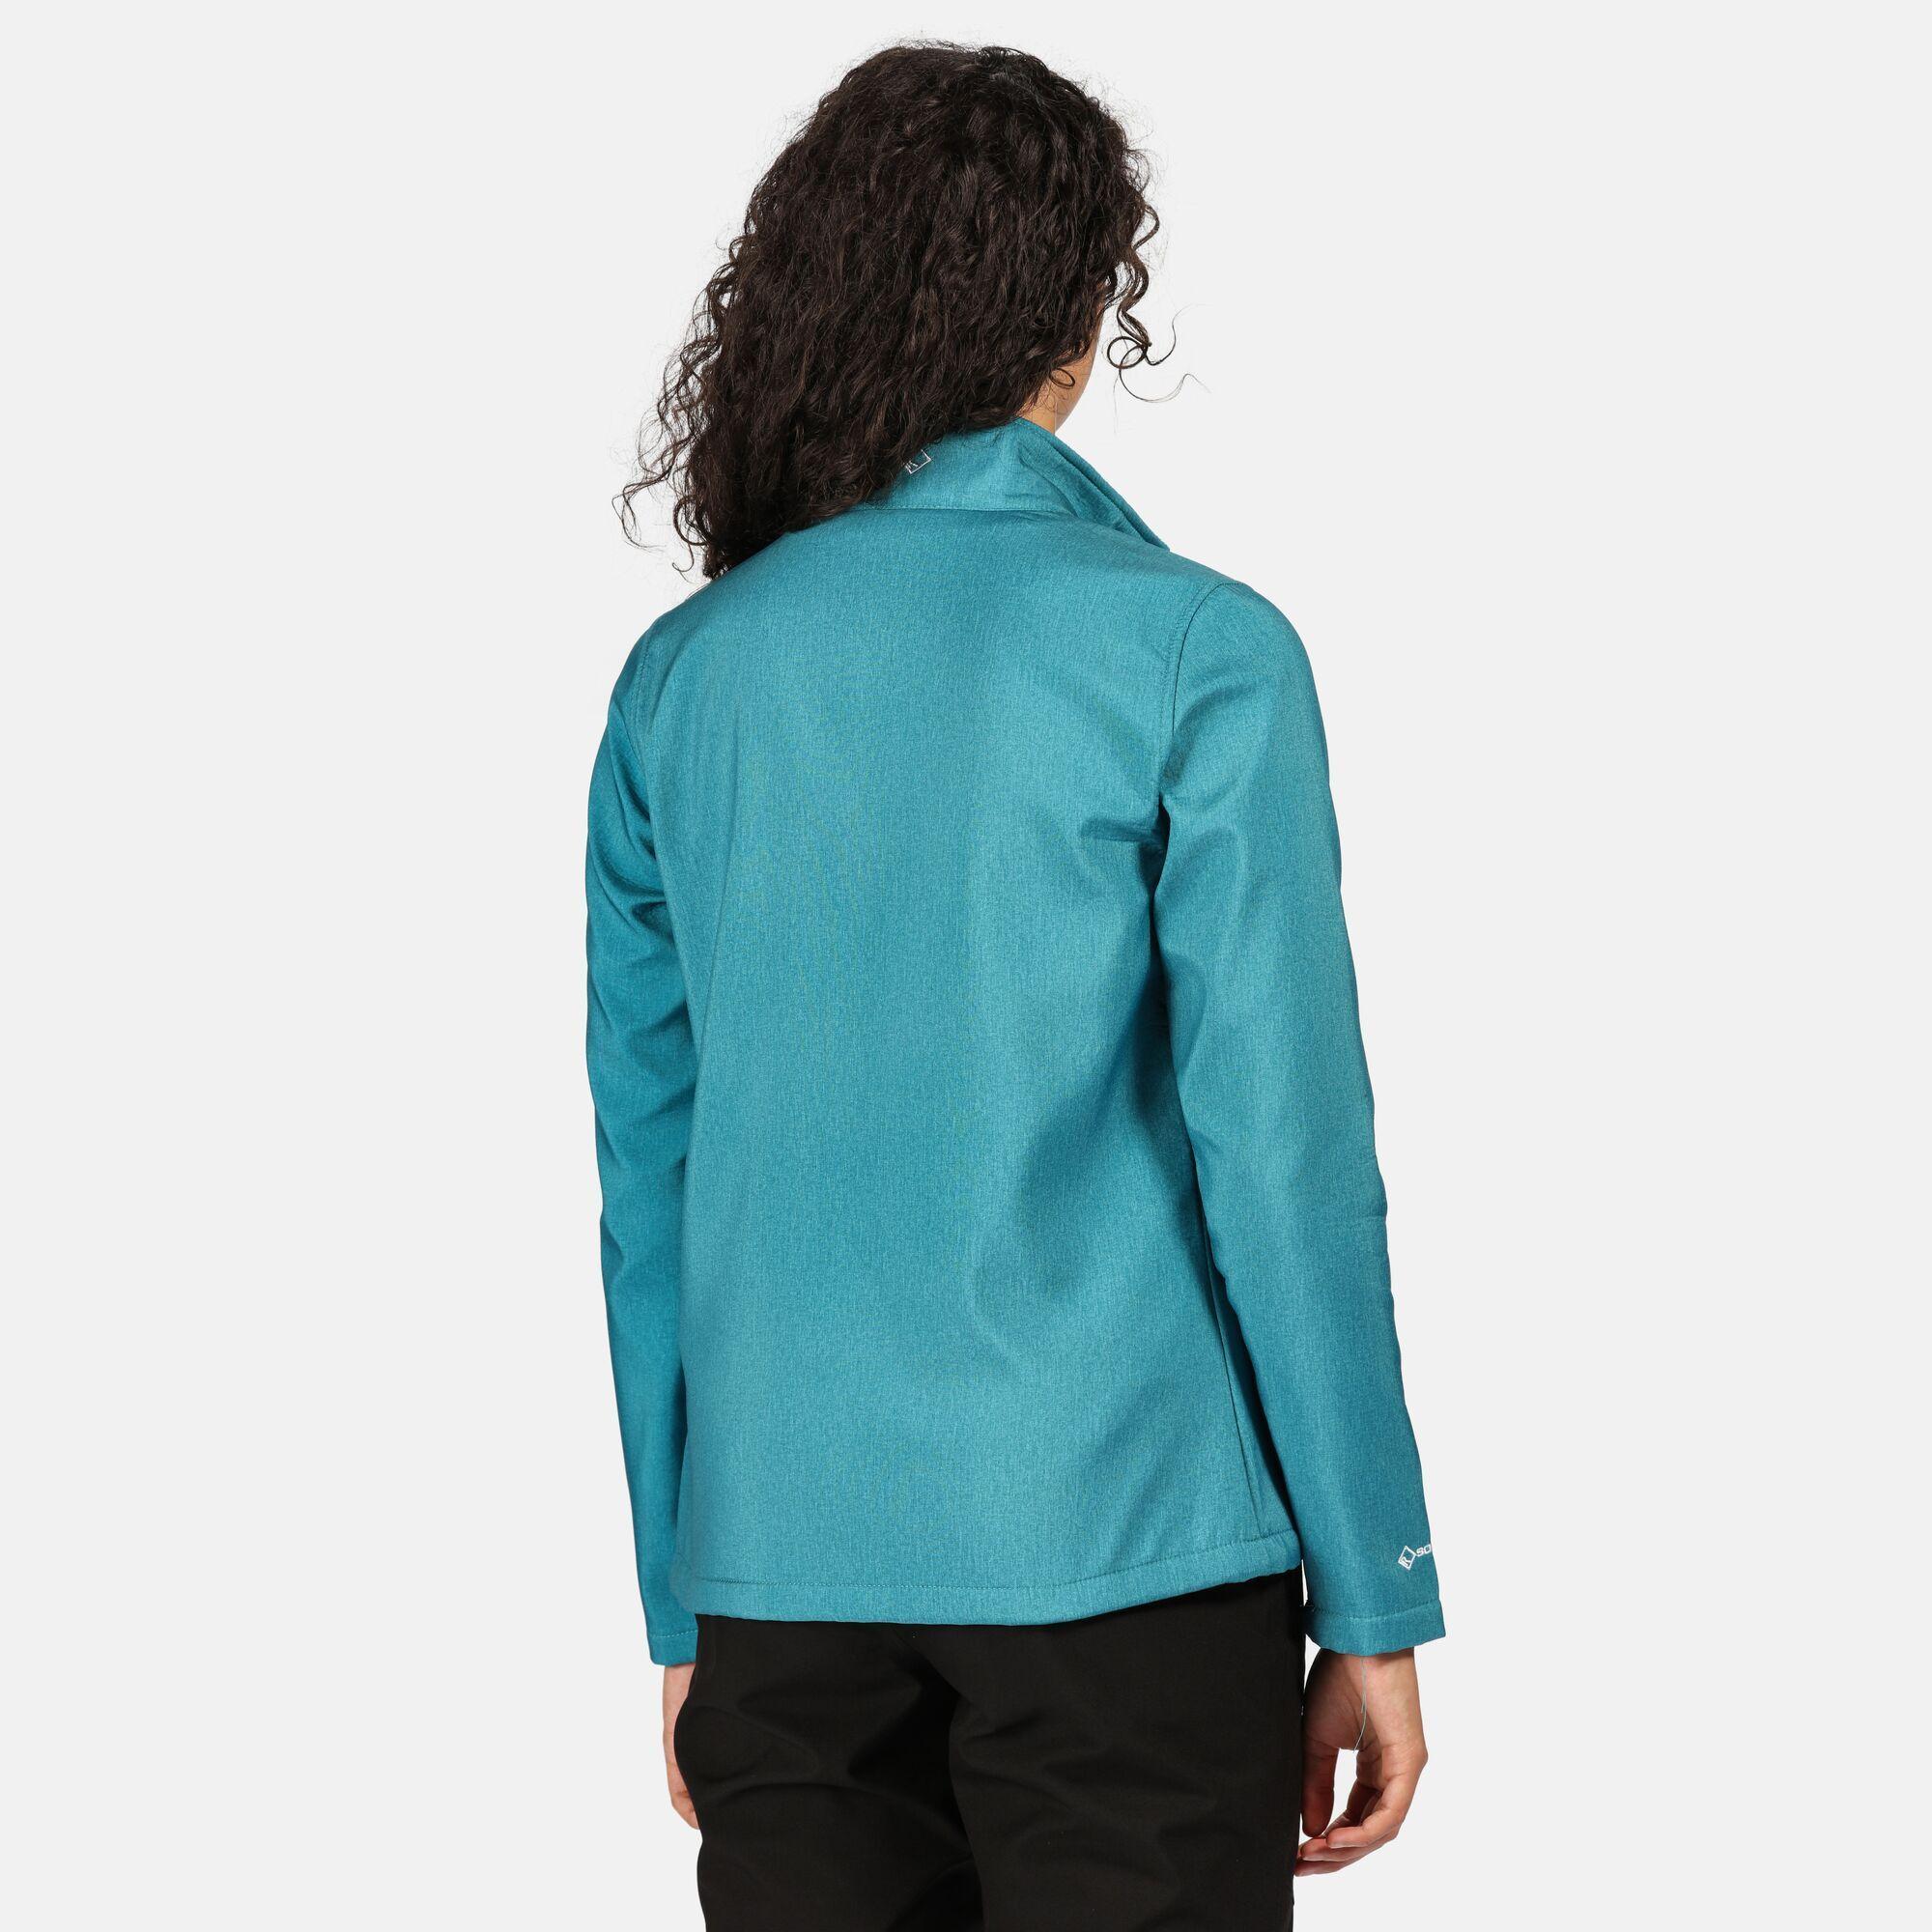 Regatta Womens/Ladies Connie IV Soft Shell Jacket (Sea Blue)